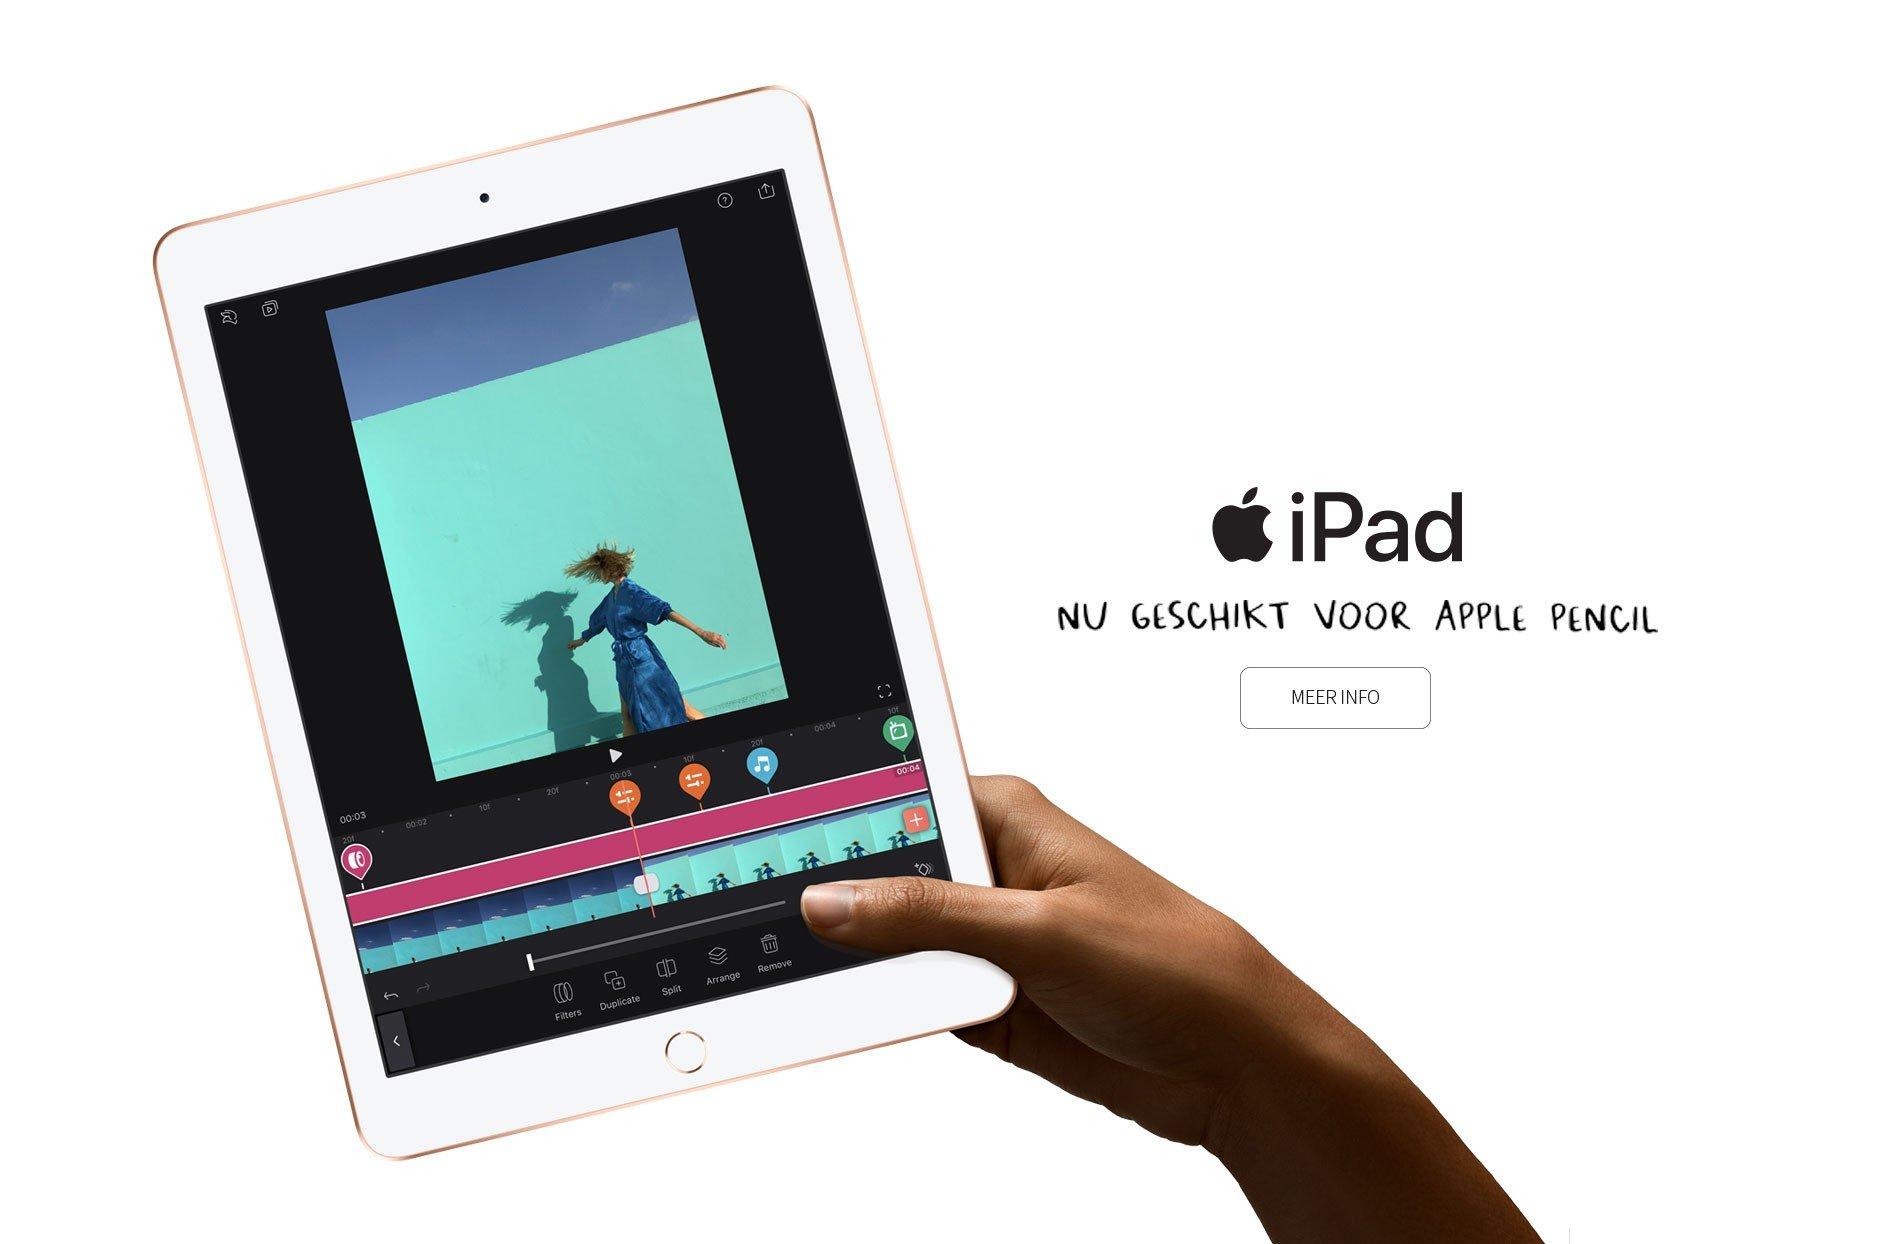 iPad97-2018-moreinfo.jpg